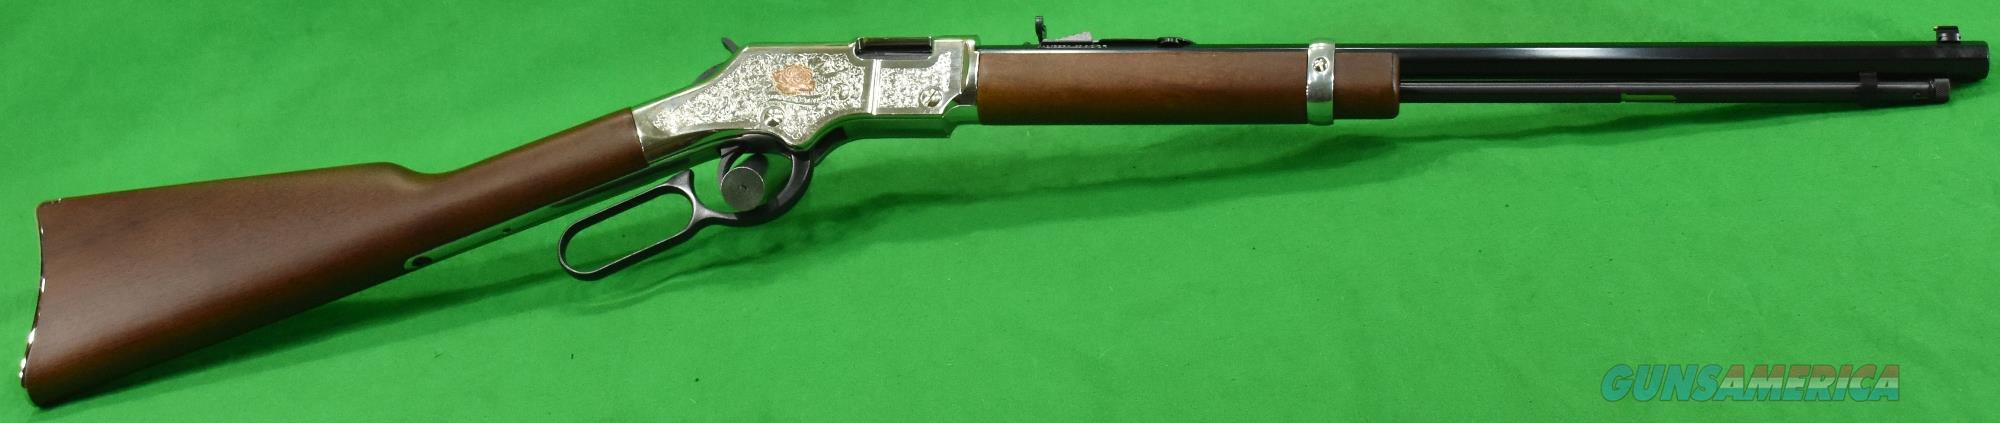 American Beauty Silver Engrv 22Lr 20In  H004AB  Guns > Rifles > Henry Rifles - Replica